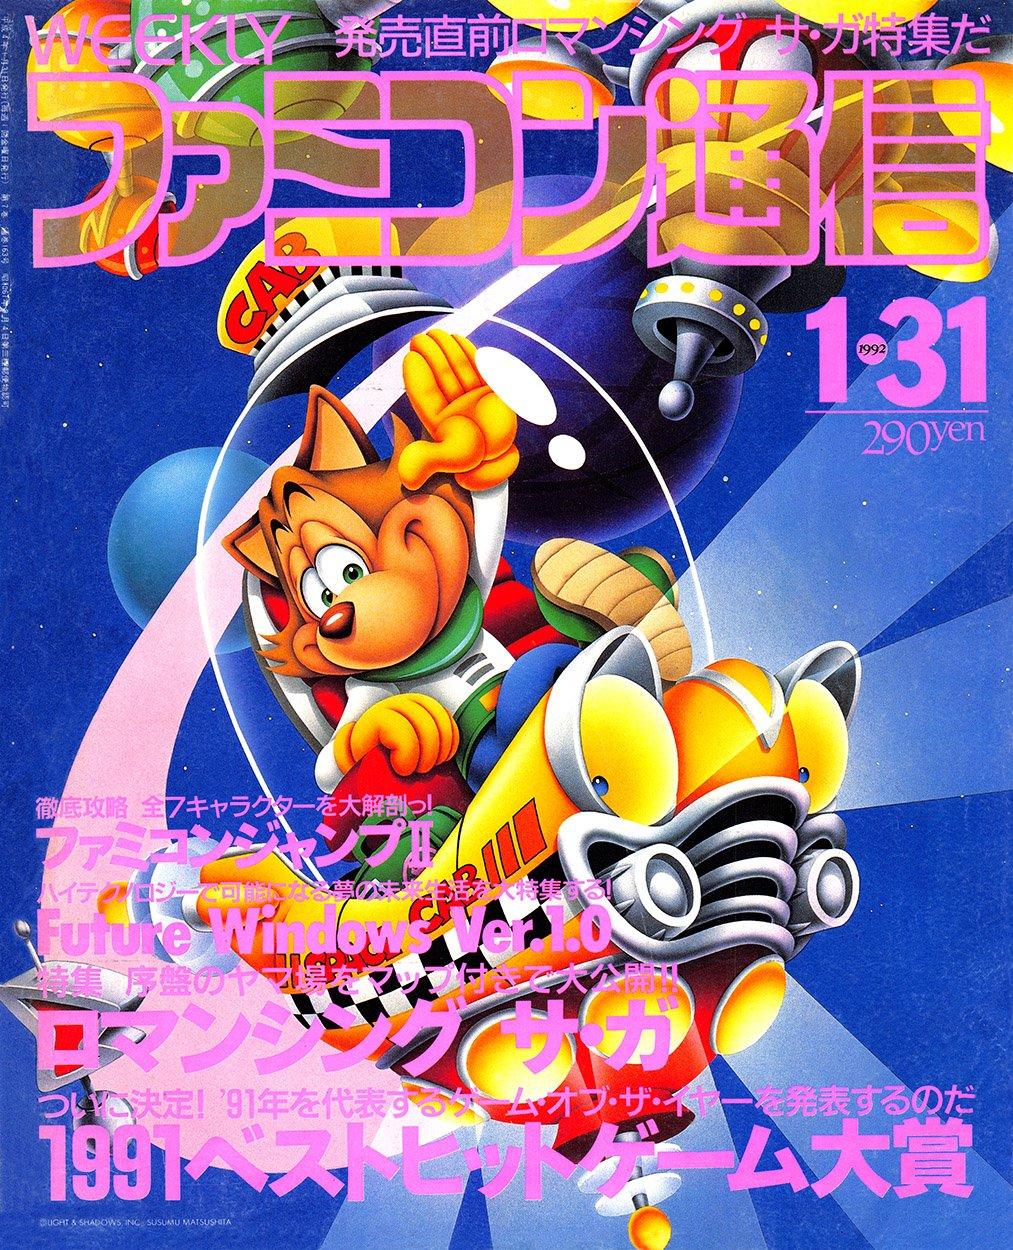 Famitsu 0163 January 31, 1992